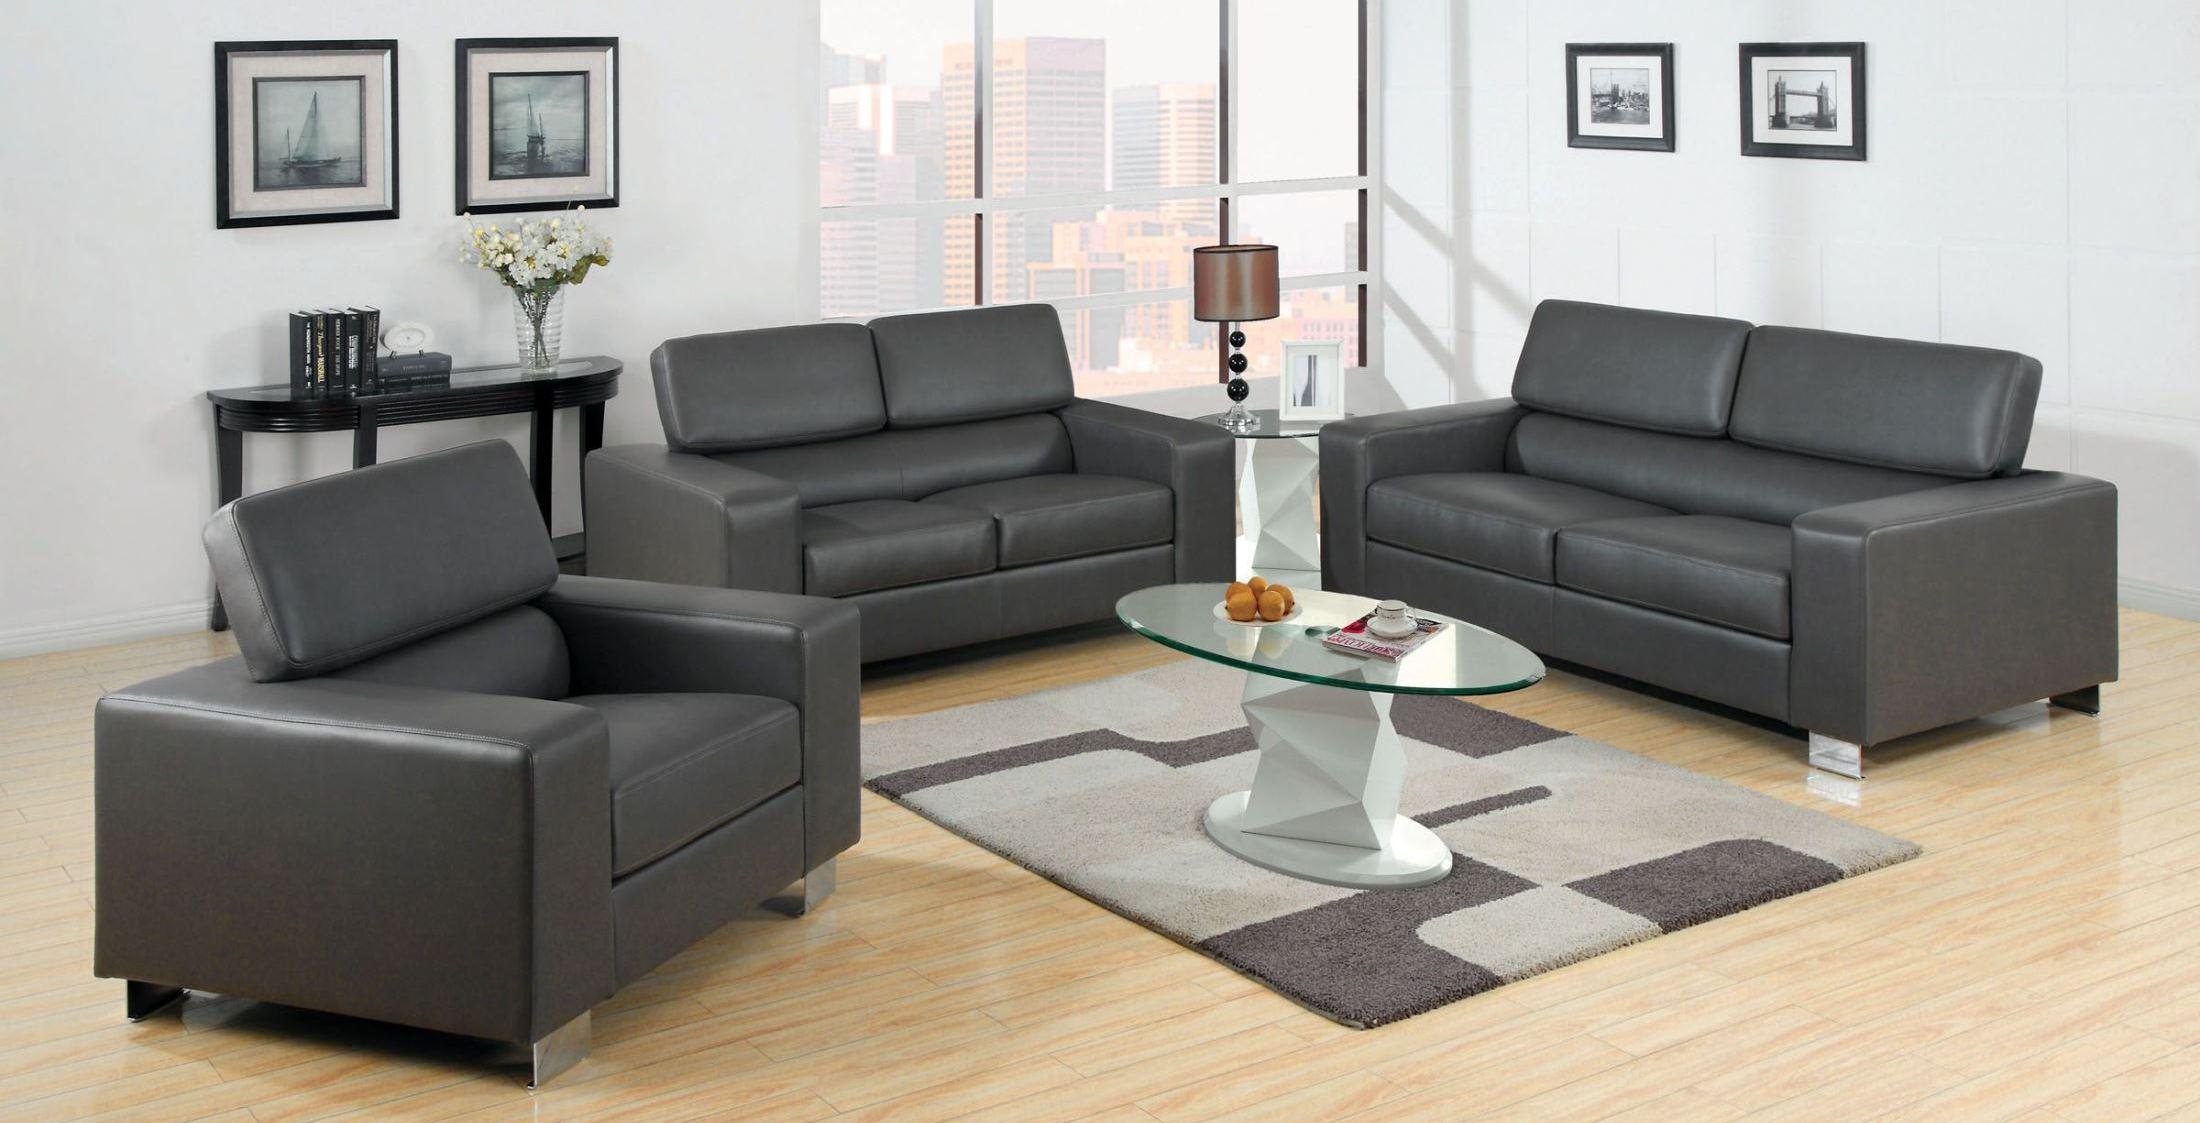 Makri Gray Bonded Leather Match Living Room Setmedia Image